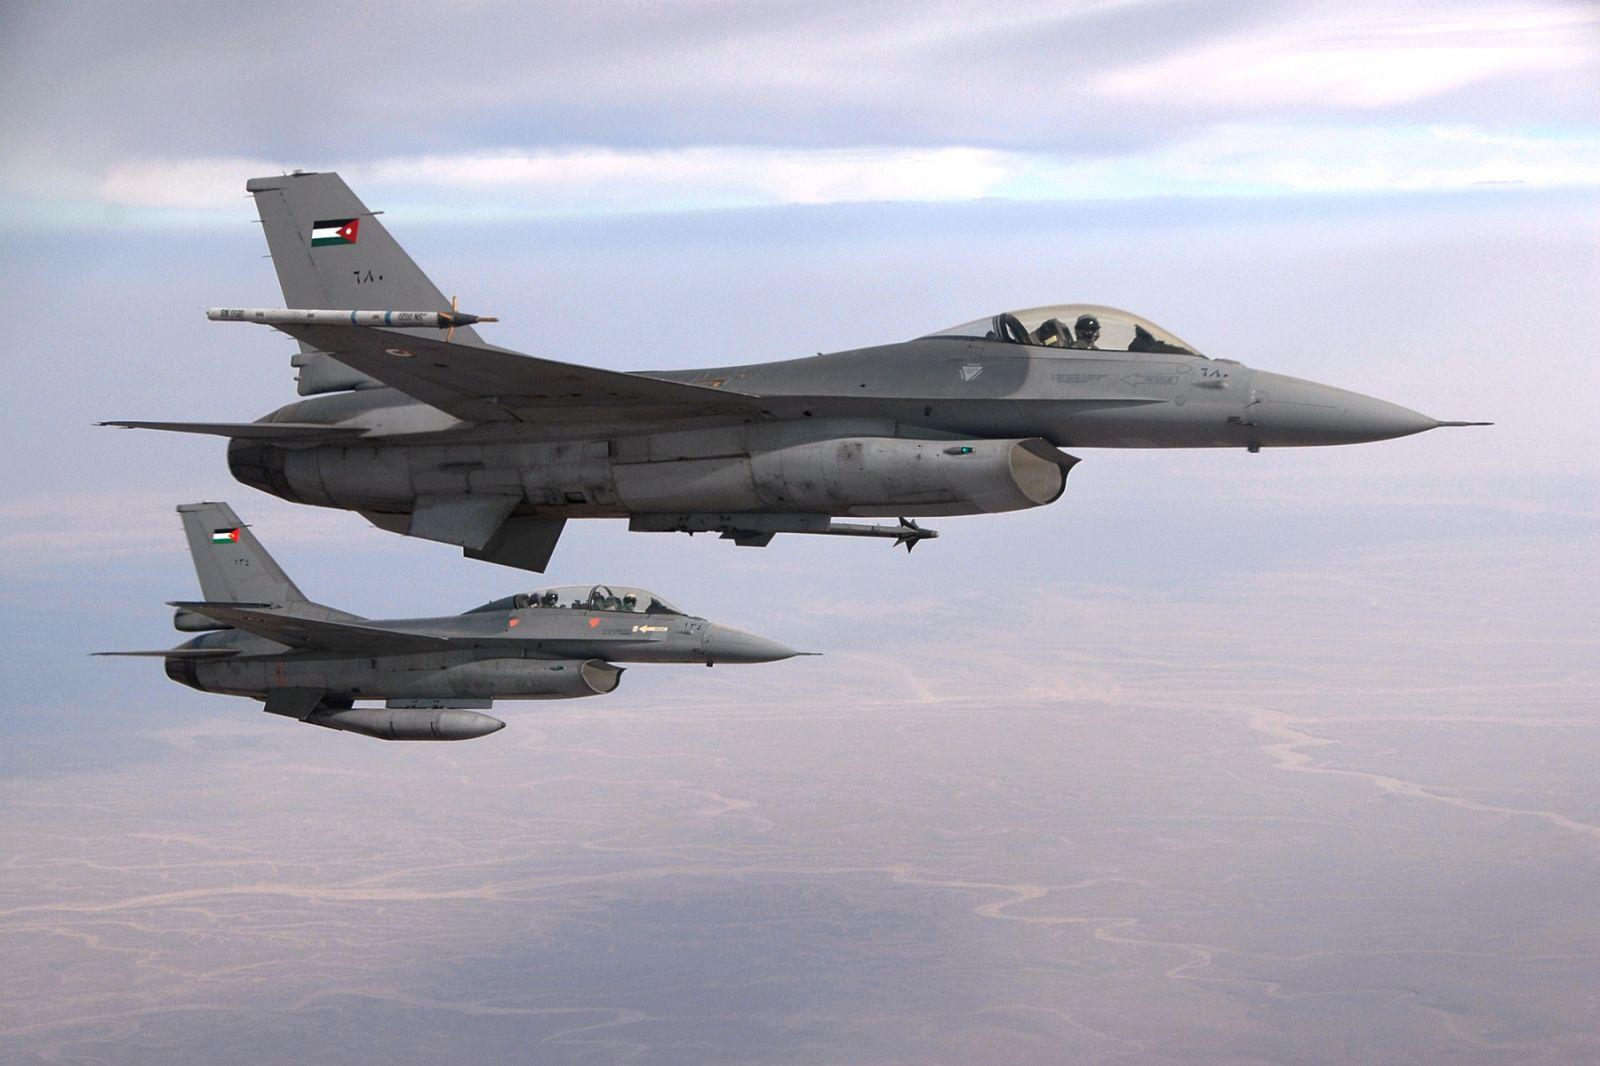 Два истребителя F-16 ВВС Иордании